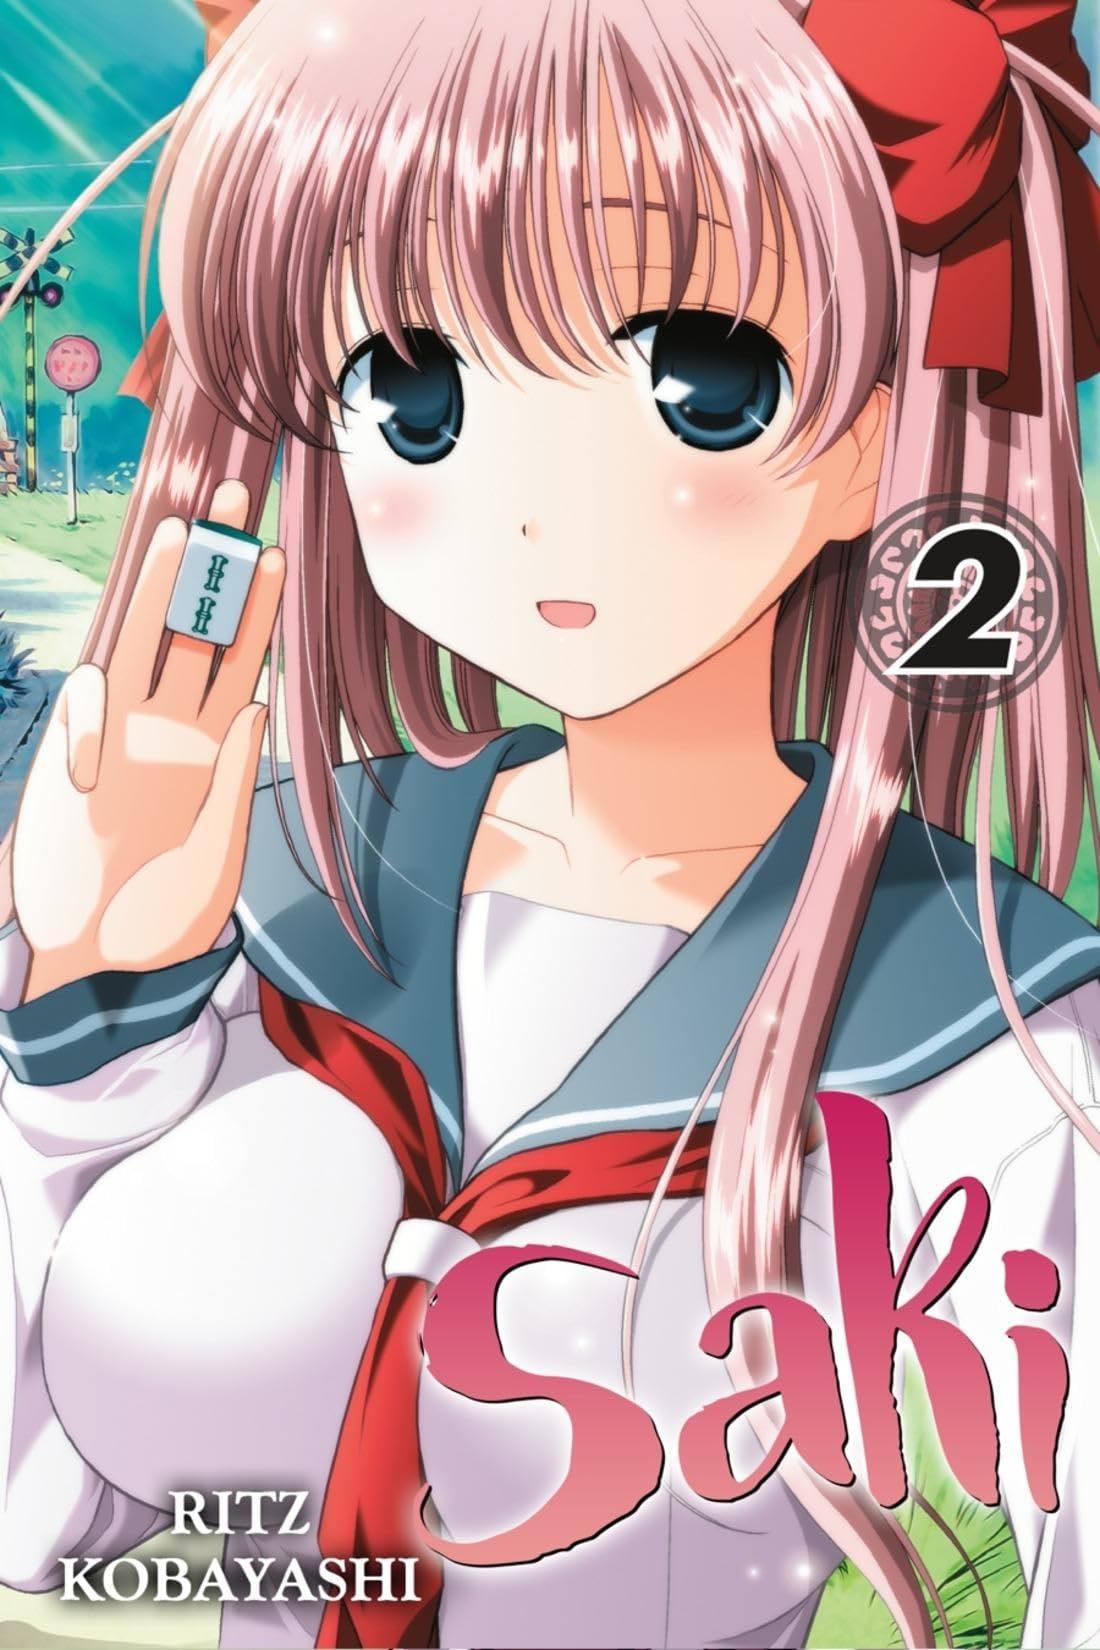 Saki Vol. 2